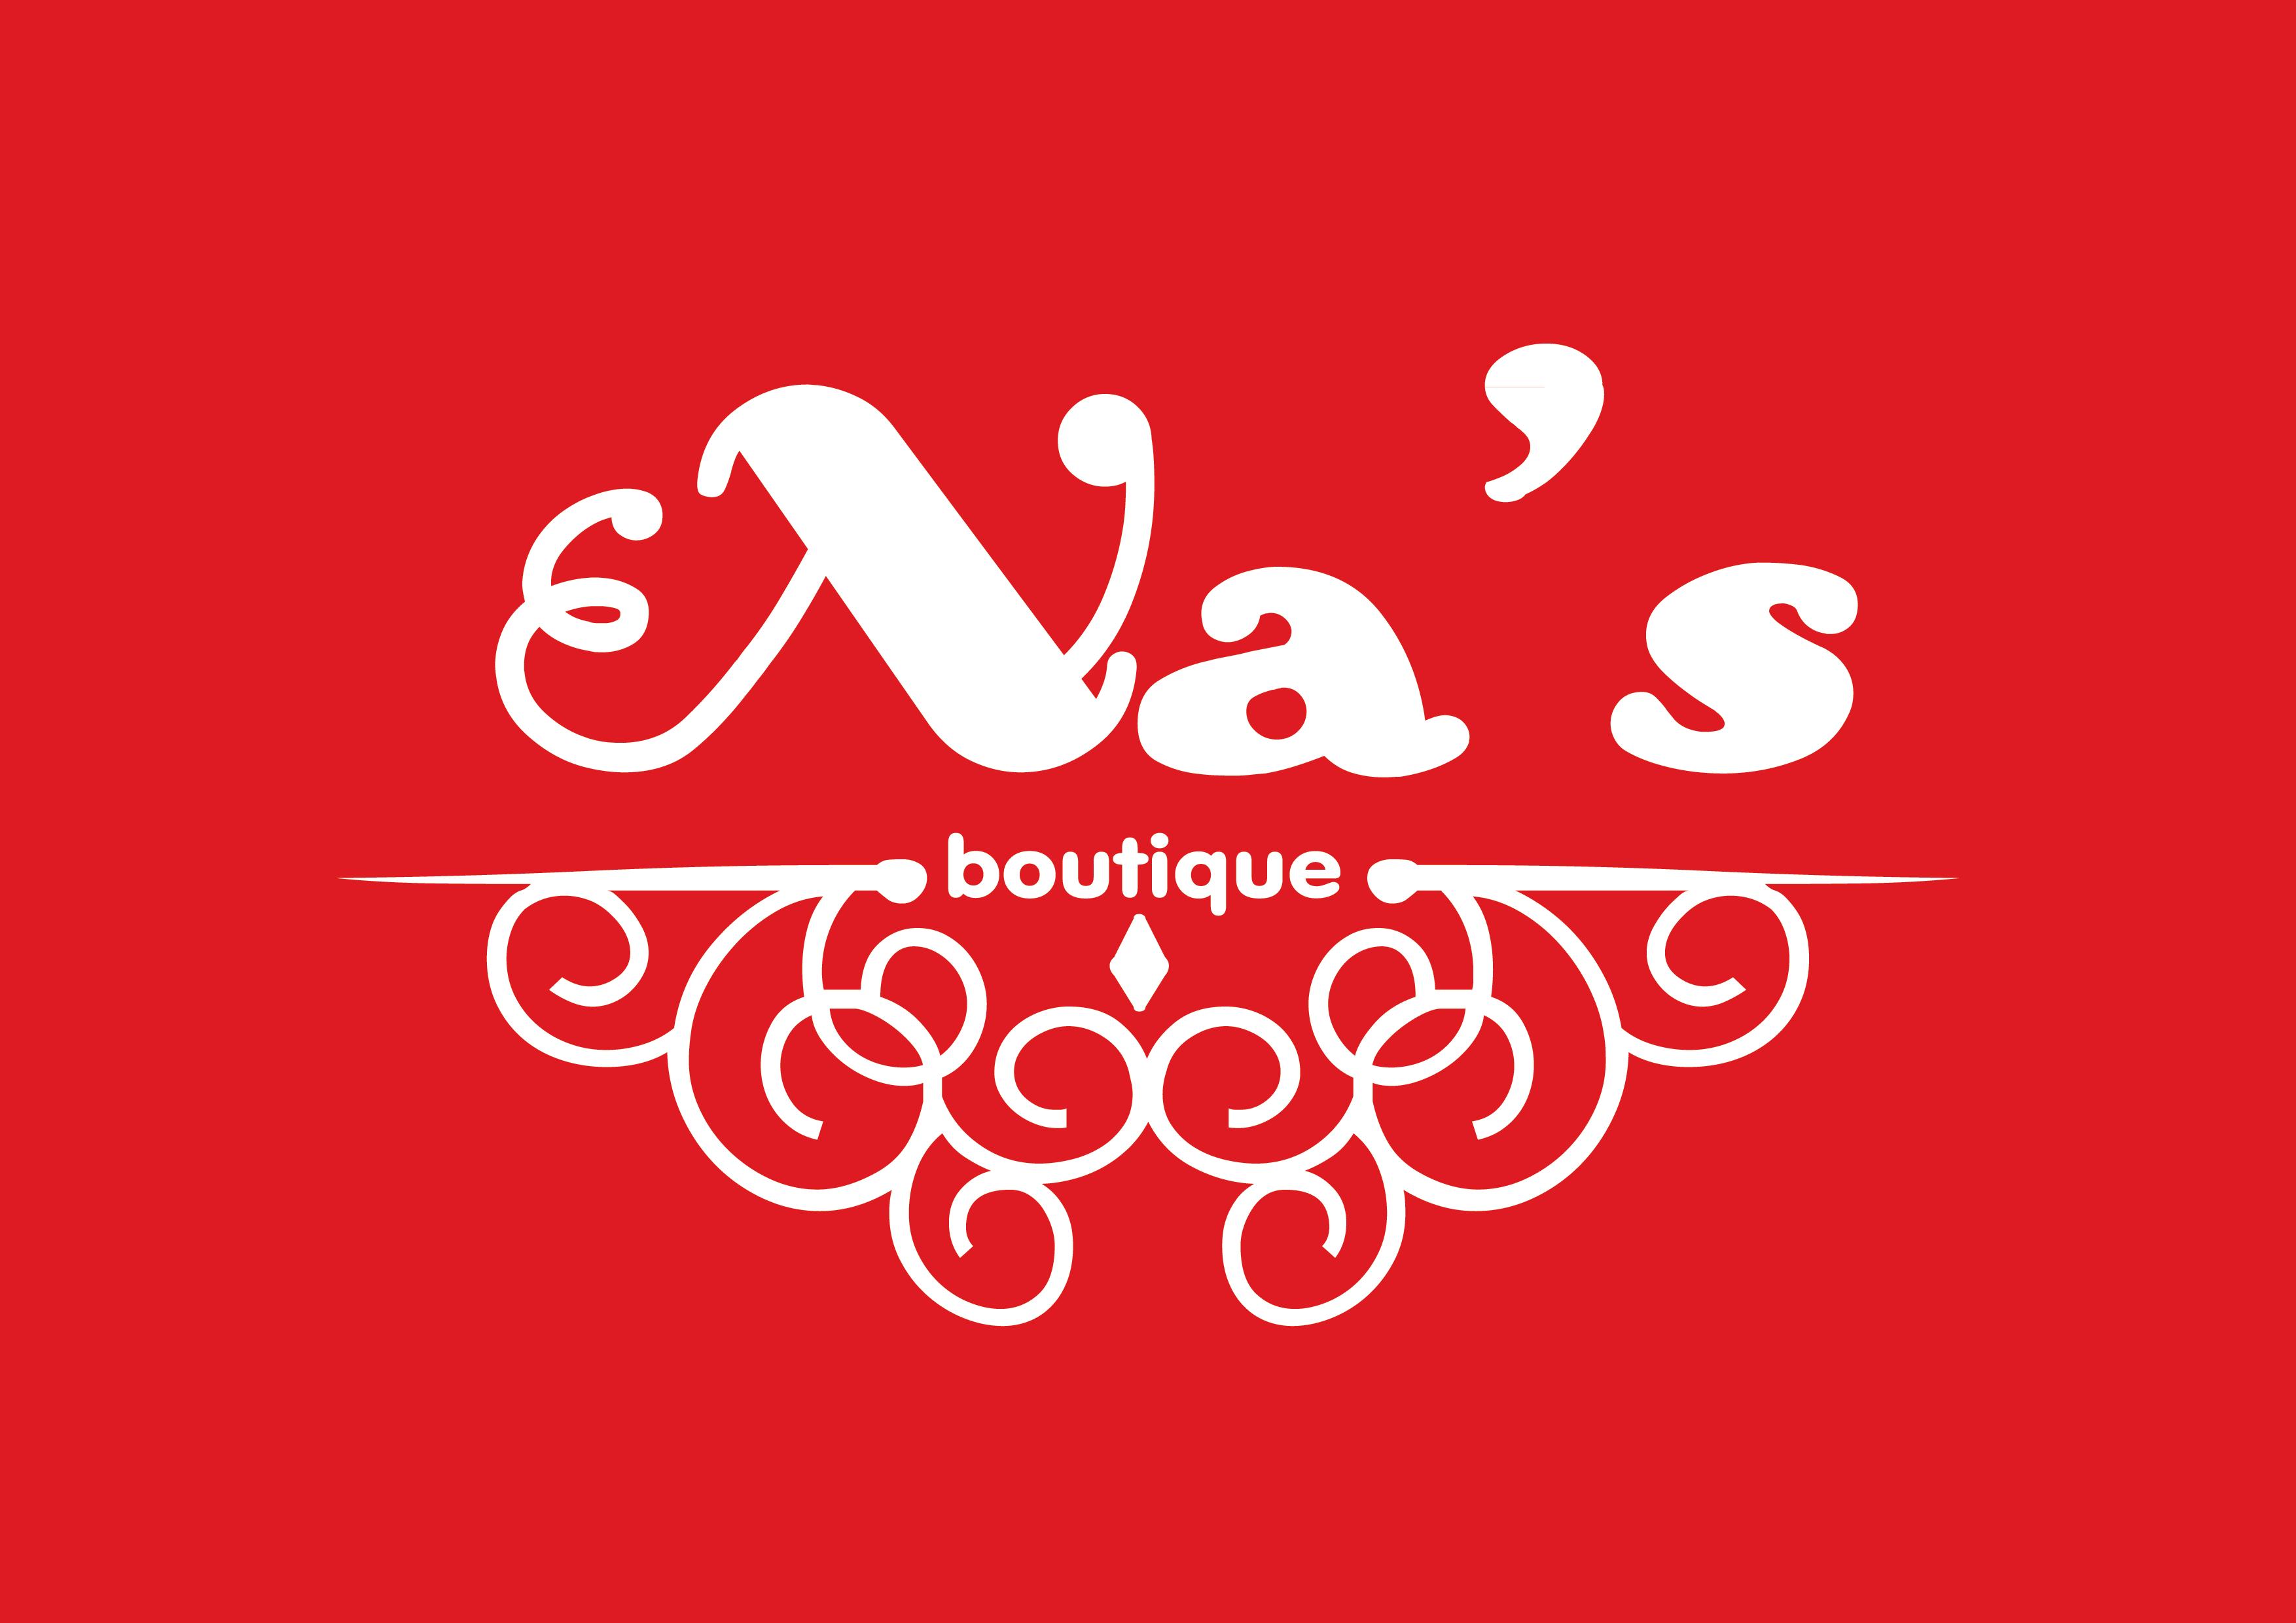 Piodio- Thiet ke logo Na boutique